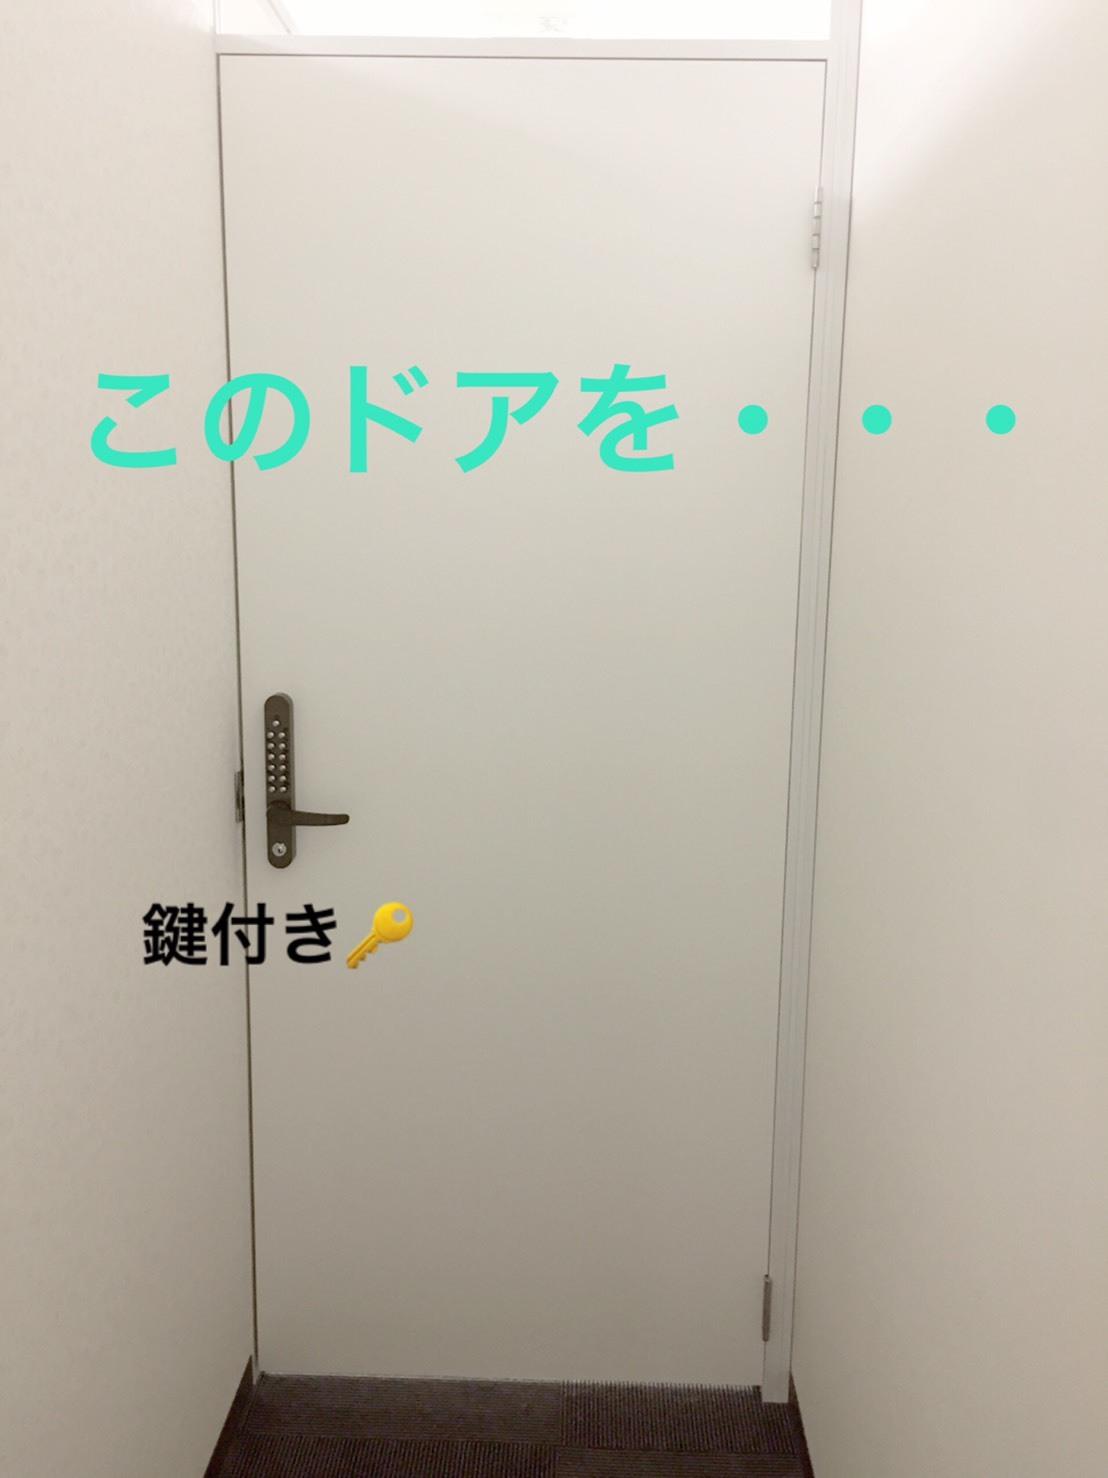 S__40837130.jpg